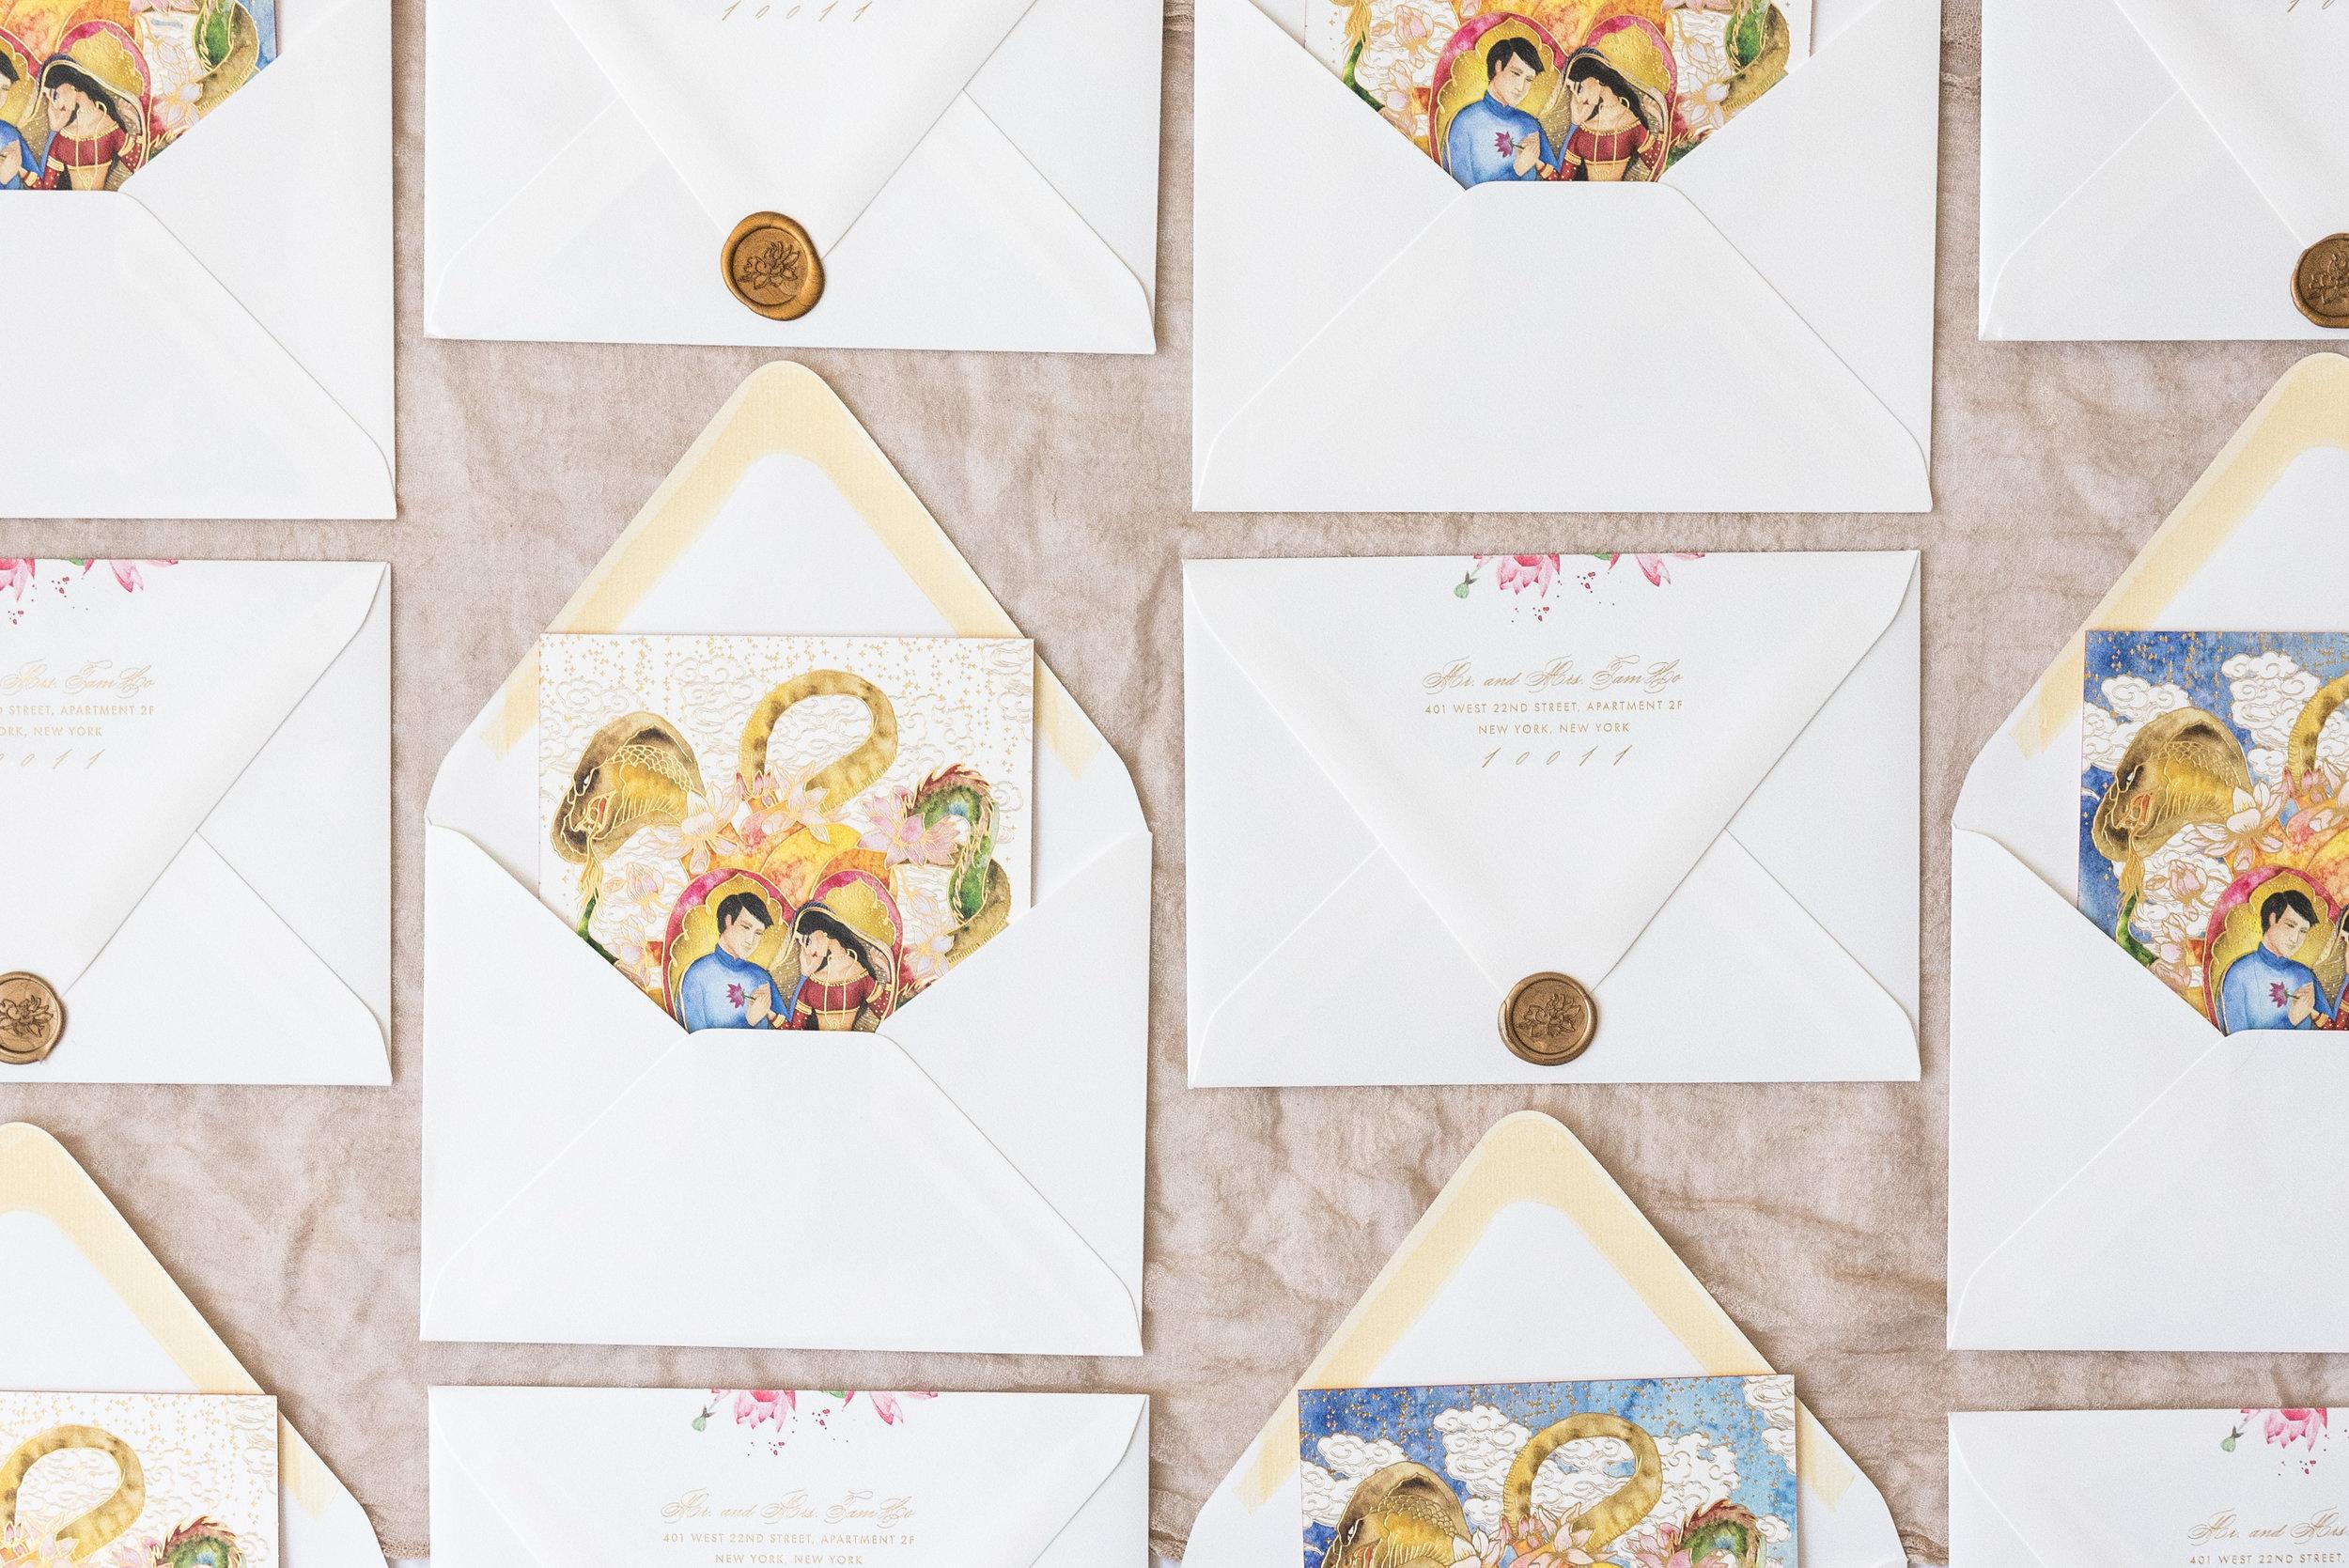 Vidhi-Dattani-Announcement-envelopes-wax-seal.jpg